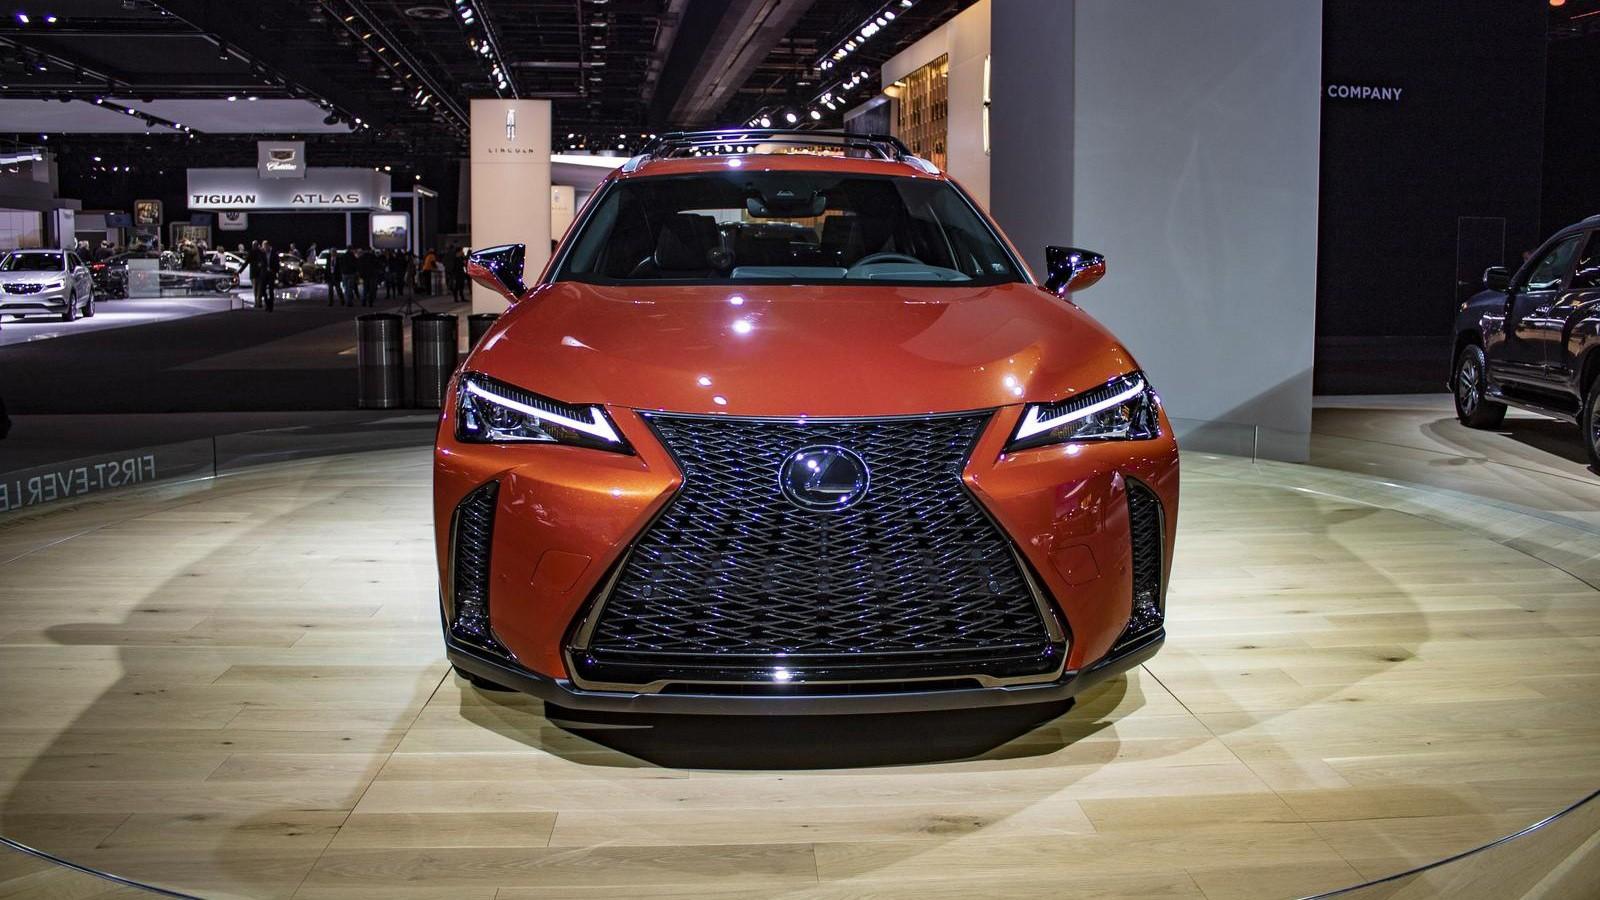 Novyj Lexus UX 2019 jekster'er, vneshnij vid, obzor, foto, tehnicheskie harakteristiki